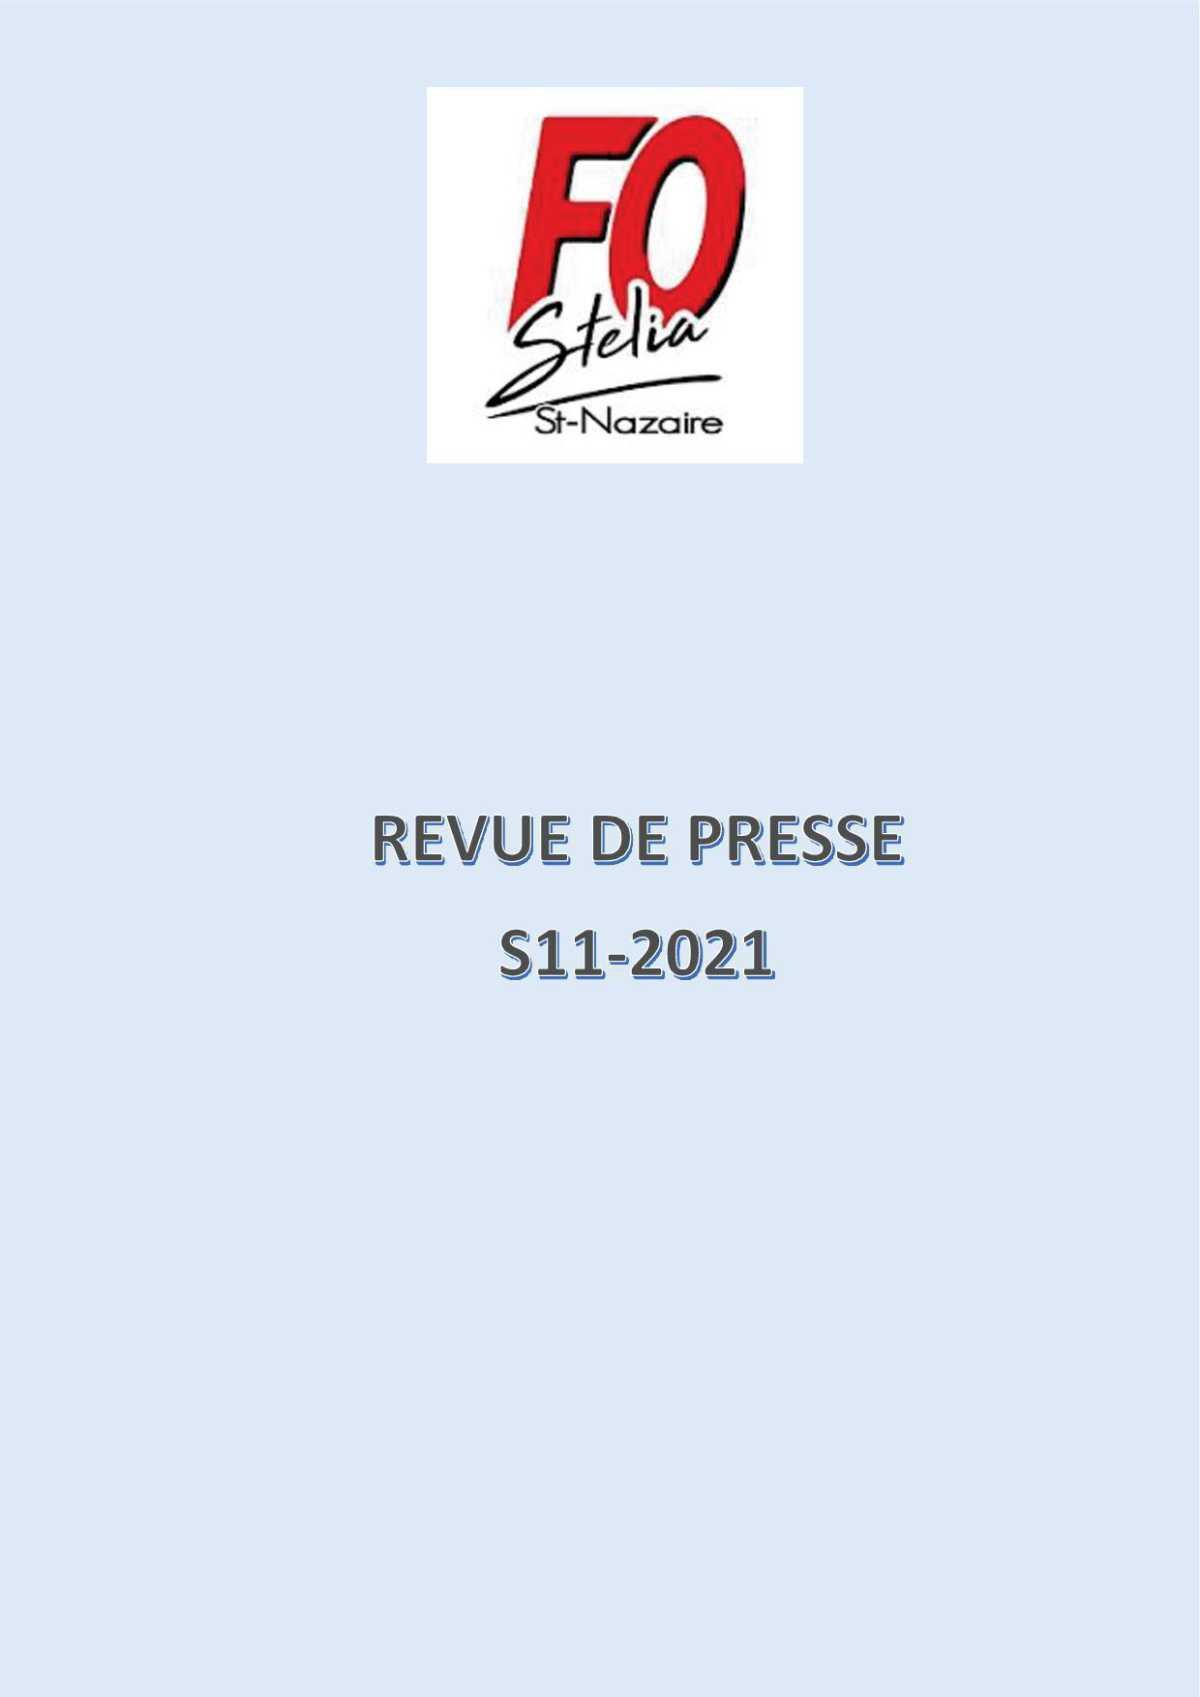 REVUE DE PRESSE S11